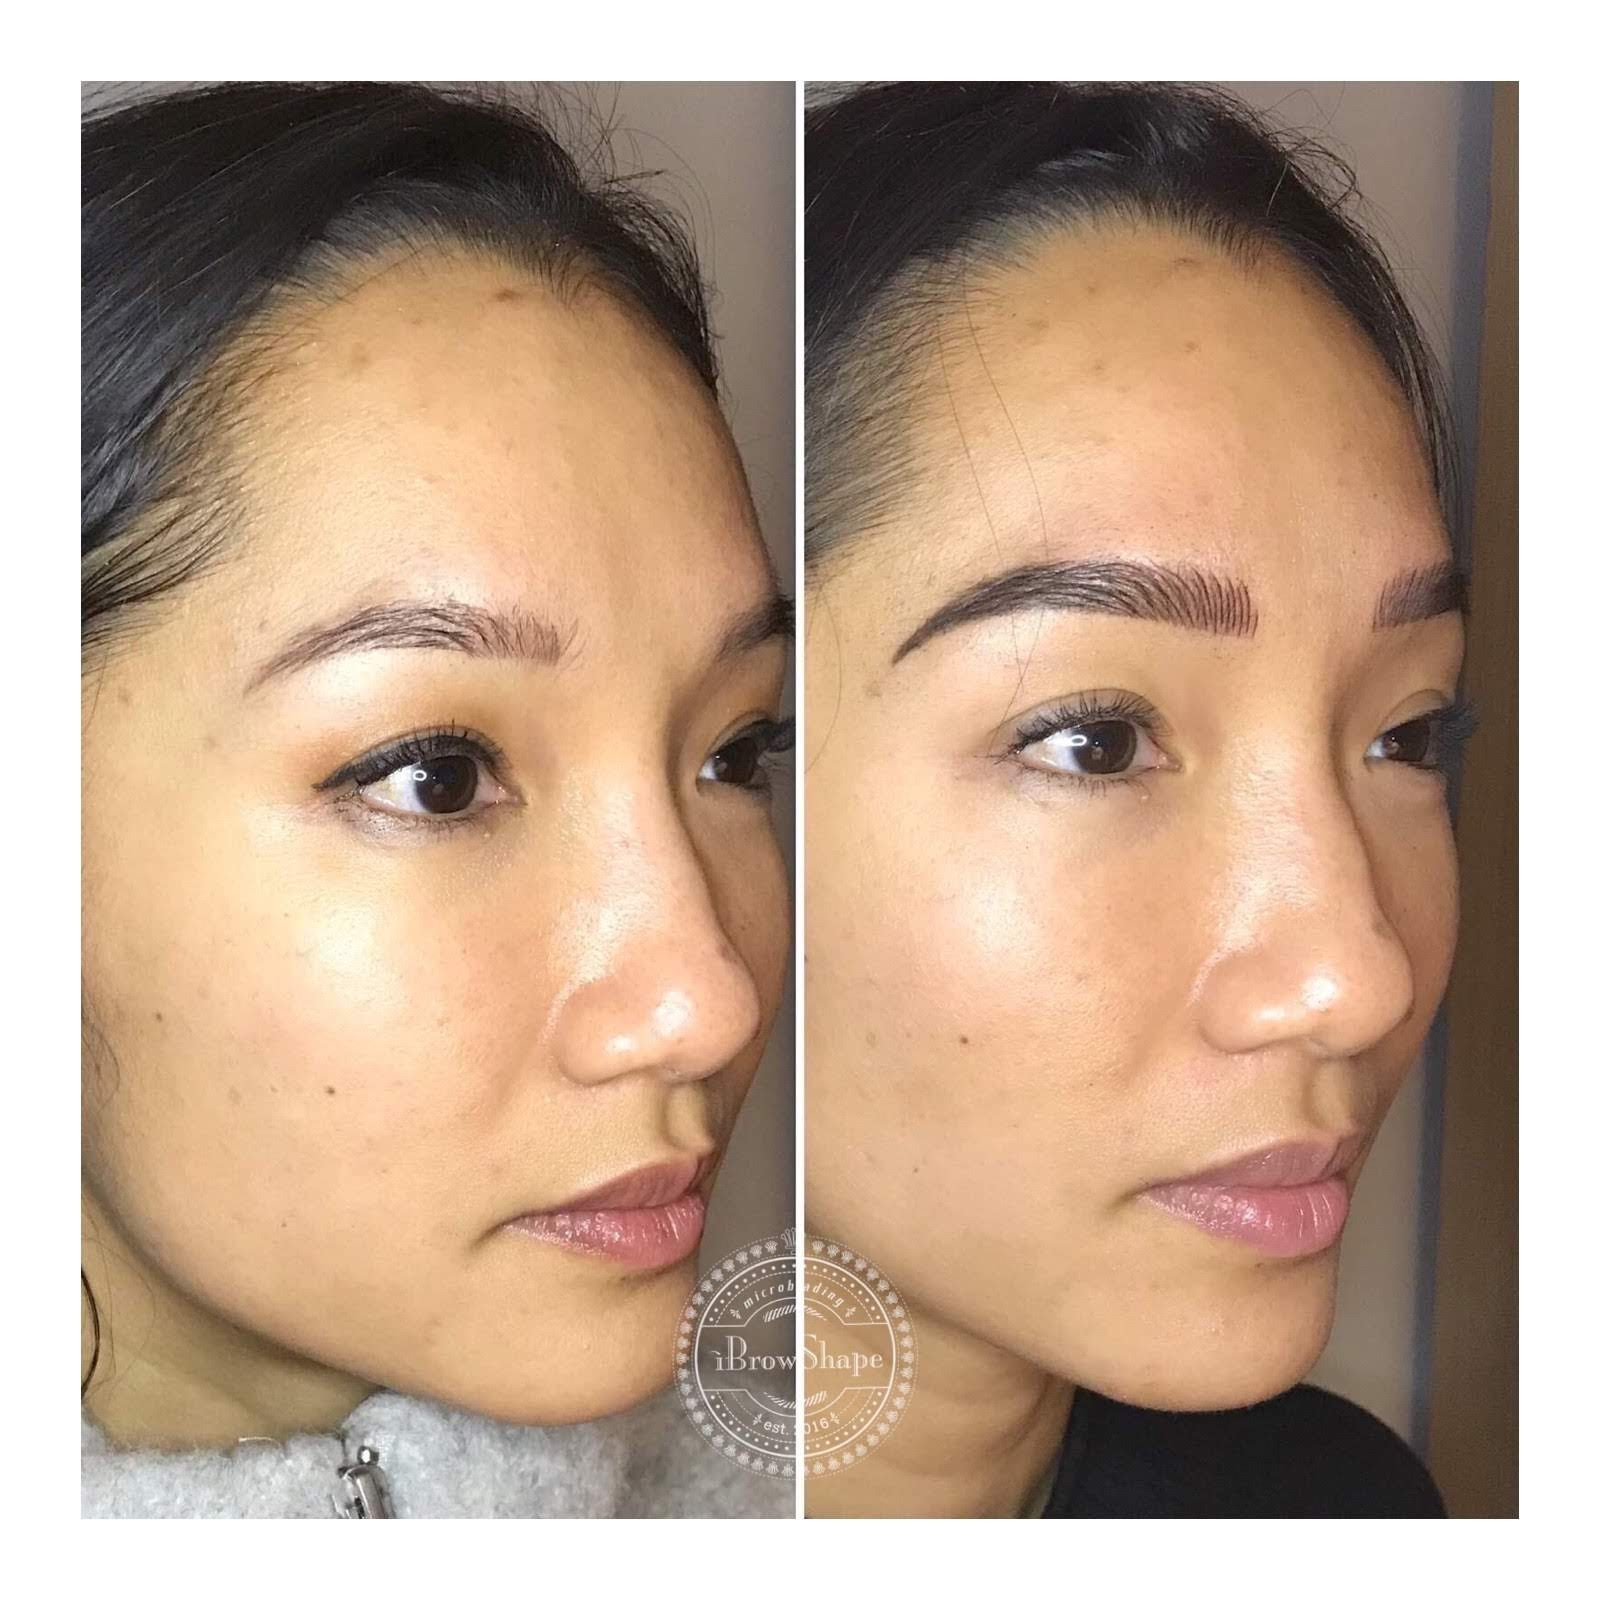 Ibrowshape_asianmicroblading_Toronto_semipermanentmakeup_beauty